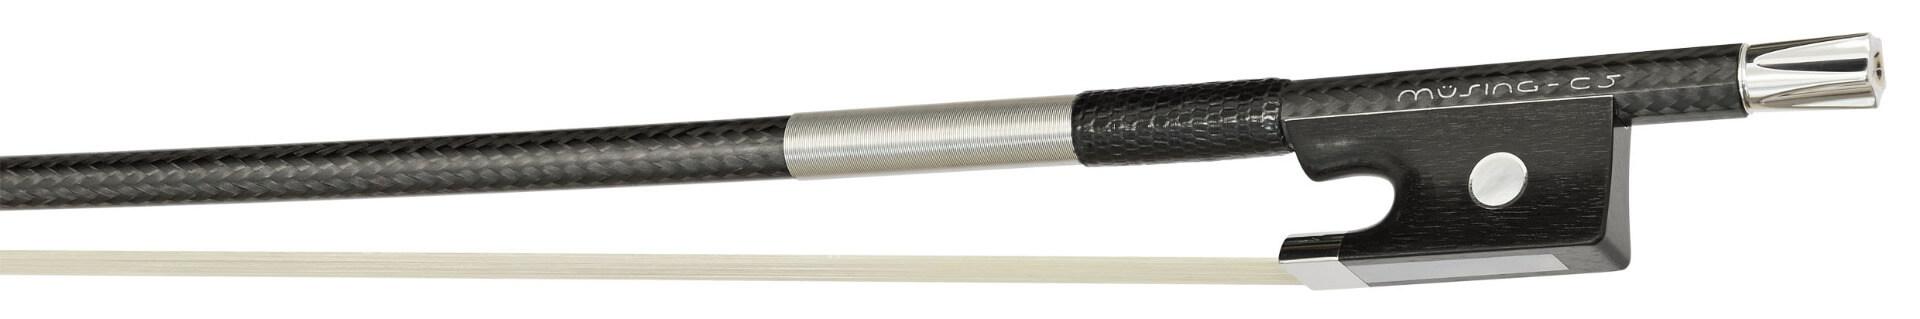 Müsing strijkstok C5 carbon vioolstrijkstok